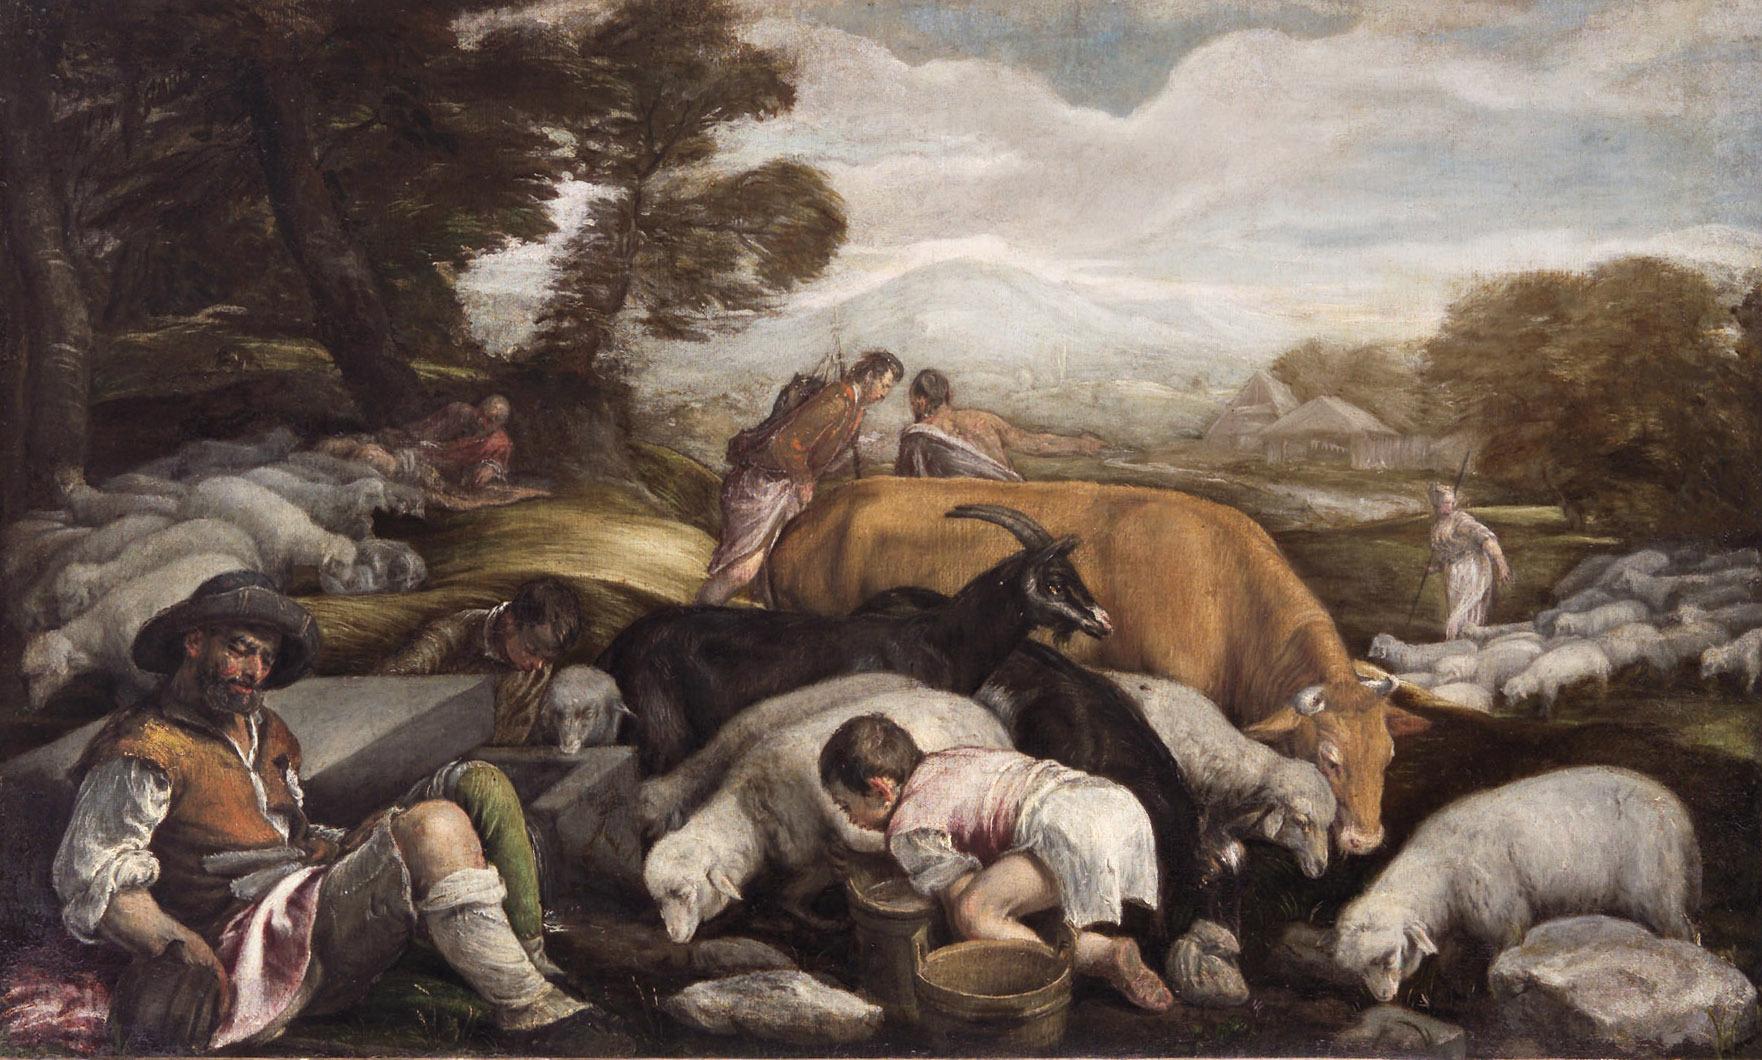 Jakob und Rahel von Francesco da Ponte, gen. Francesco Bassano